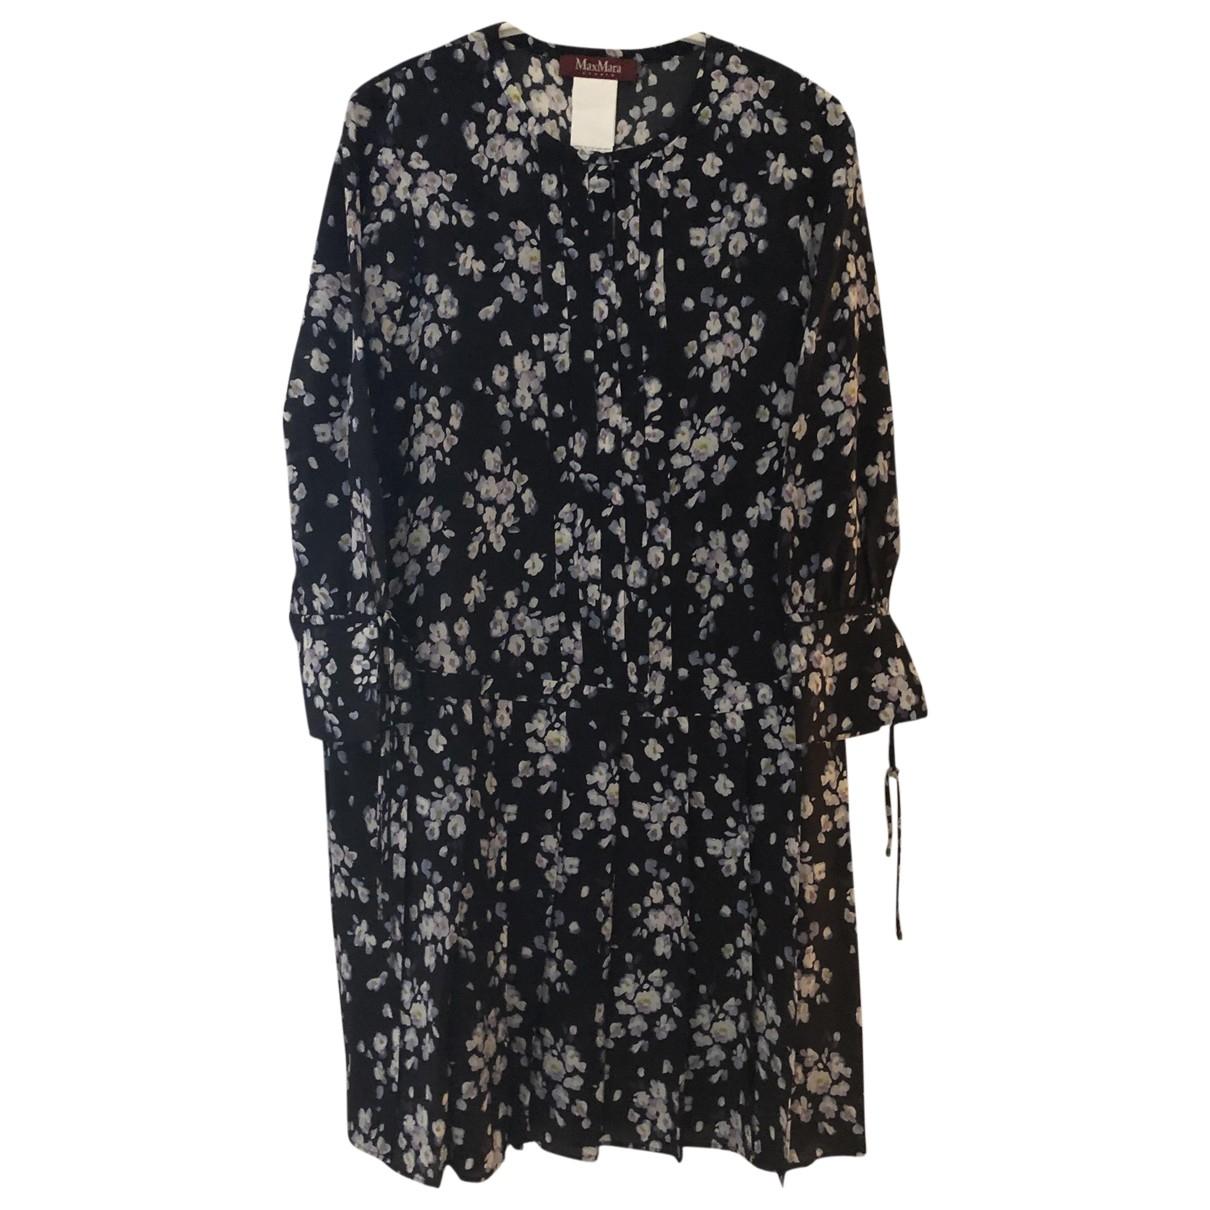 Max Mara Studio \N Multicolour Silk dress for Women 8 UK